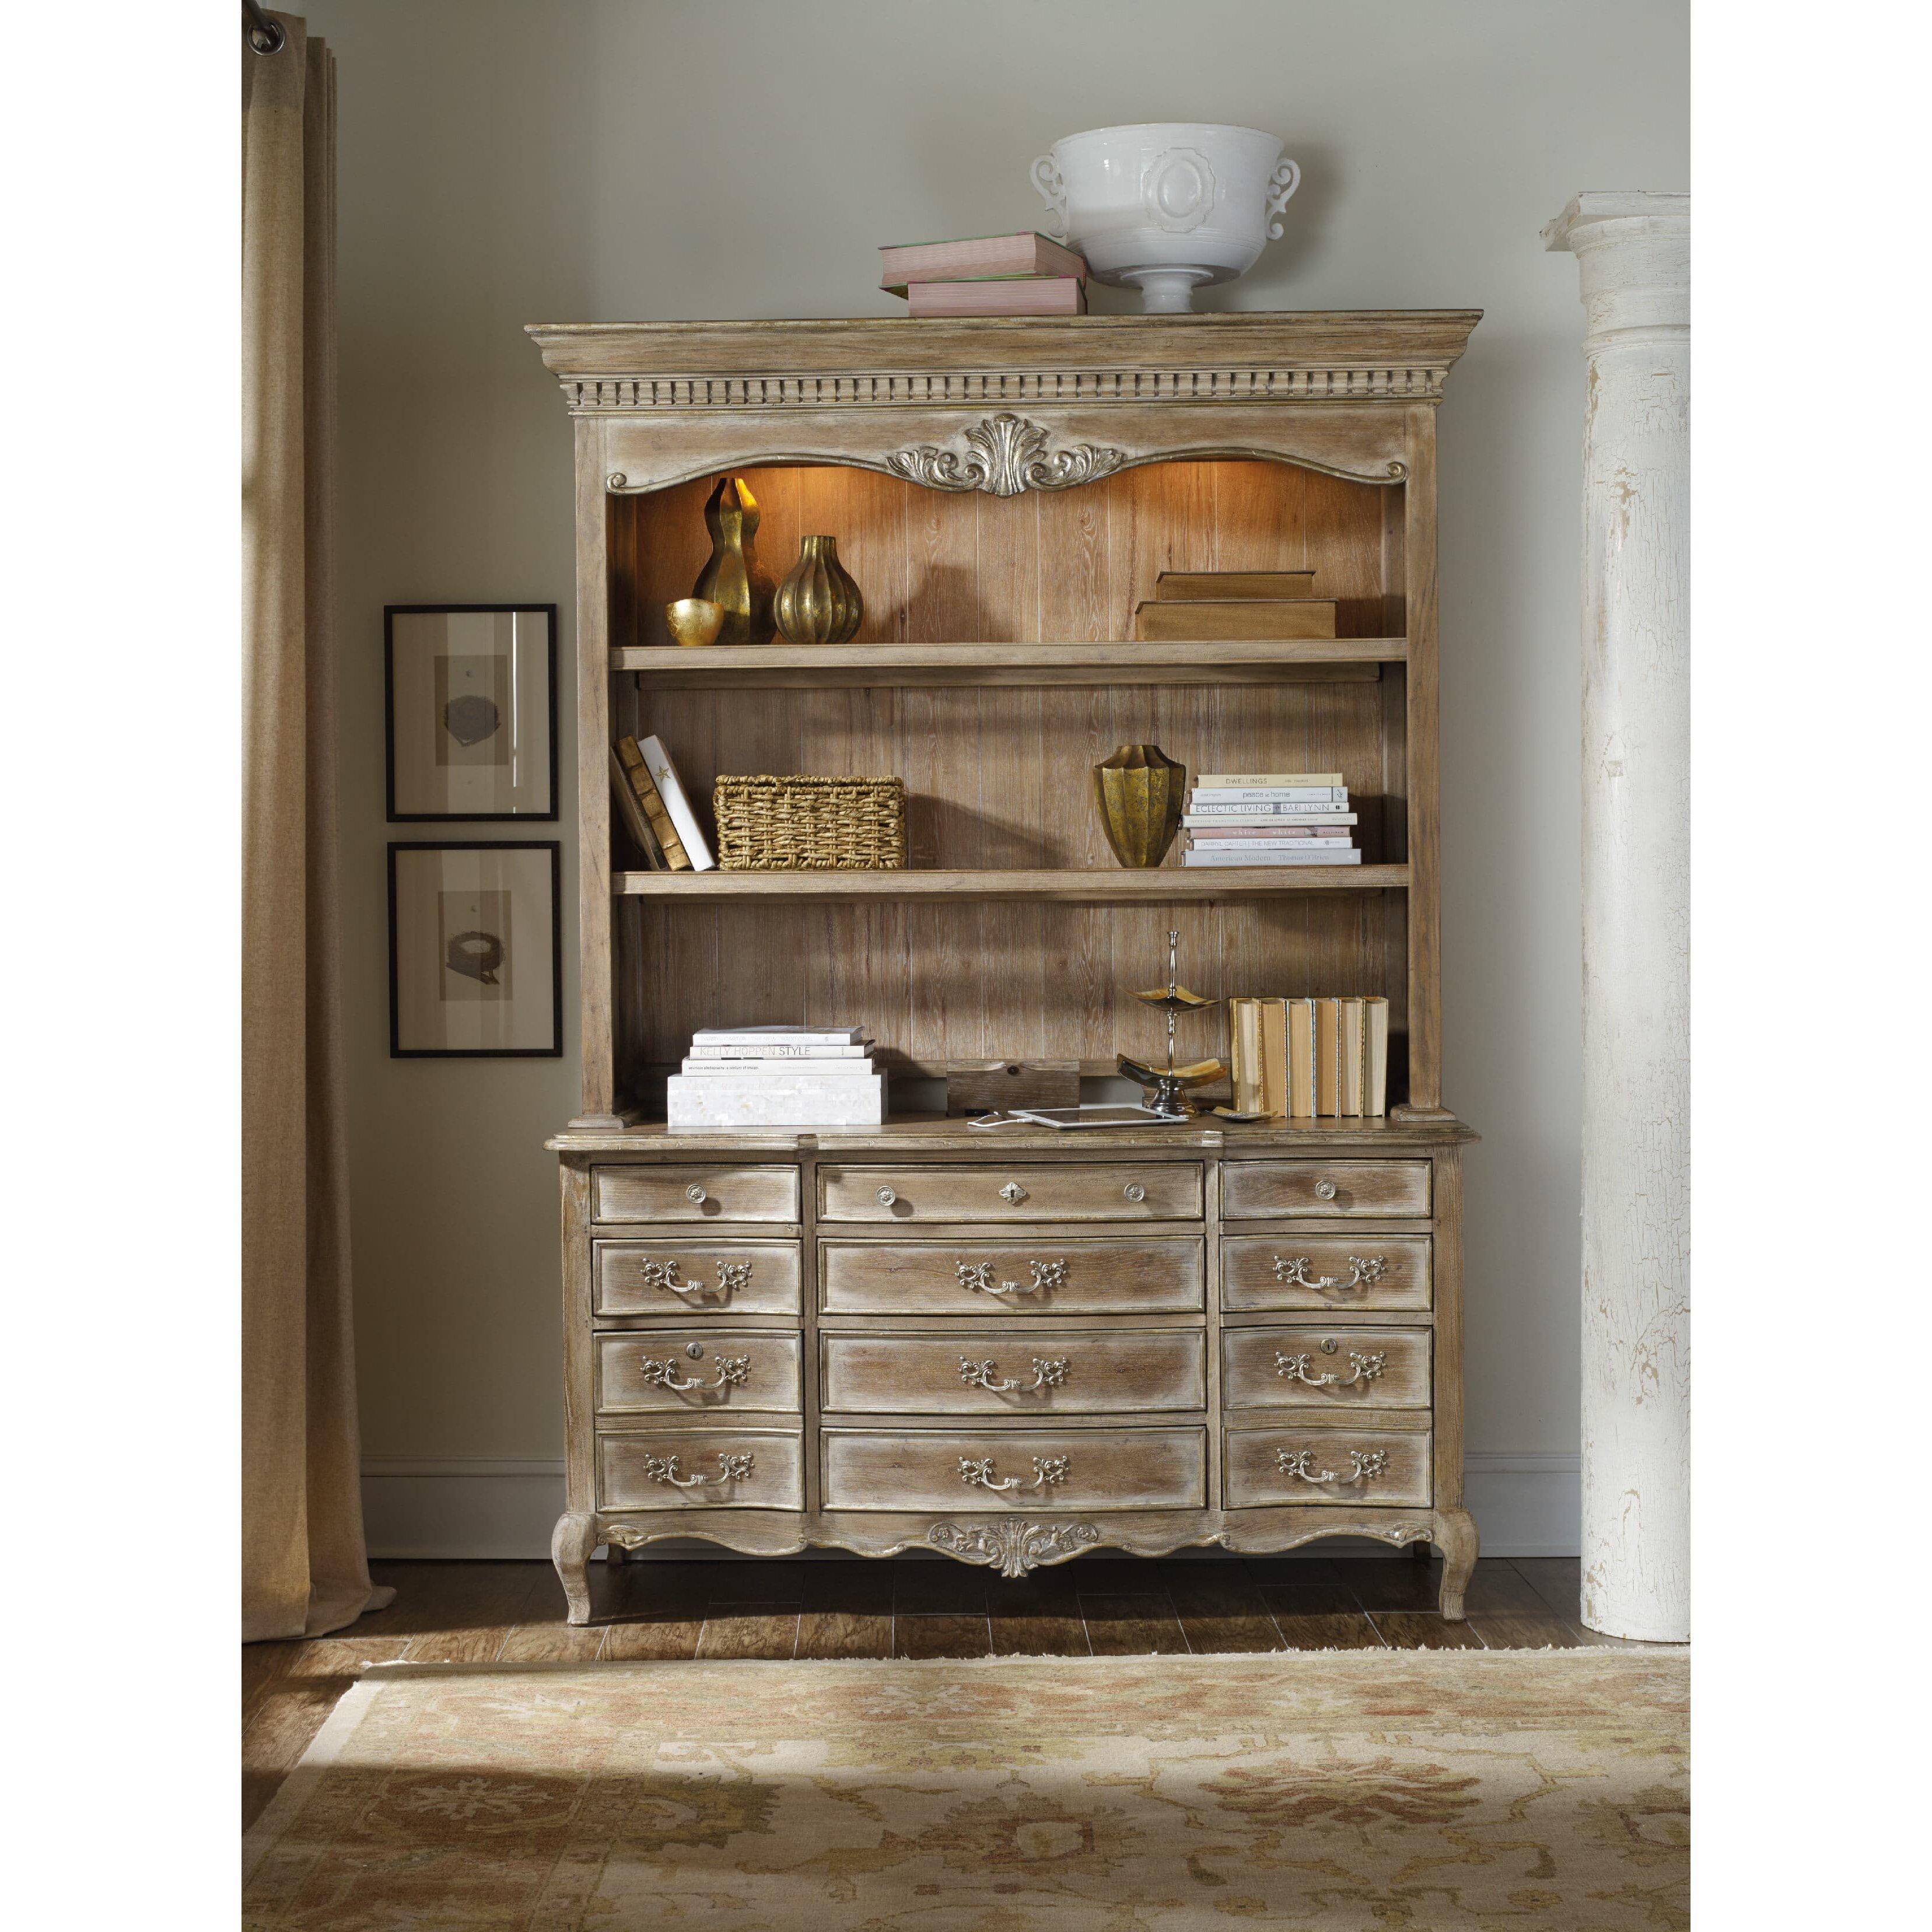 Hooker furniture la maison du travial credenza desk for A la maison furniture